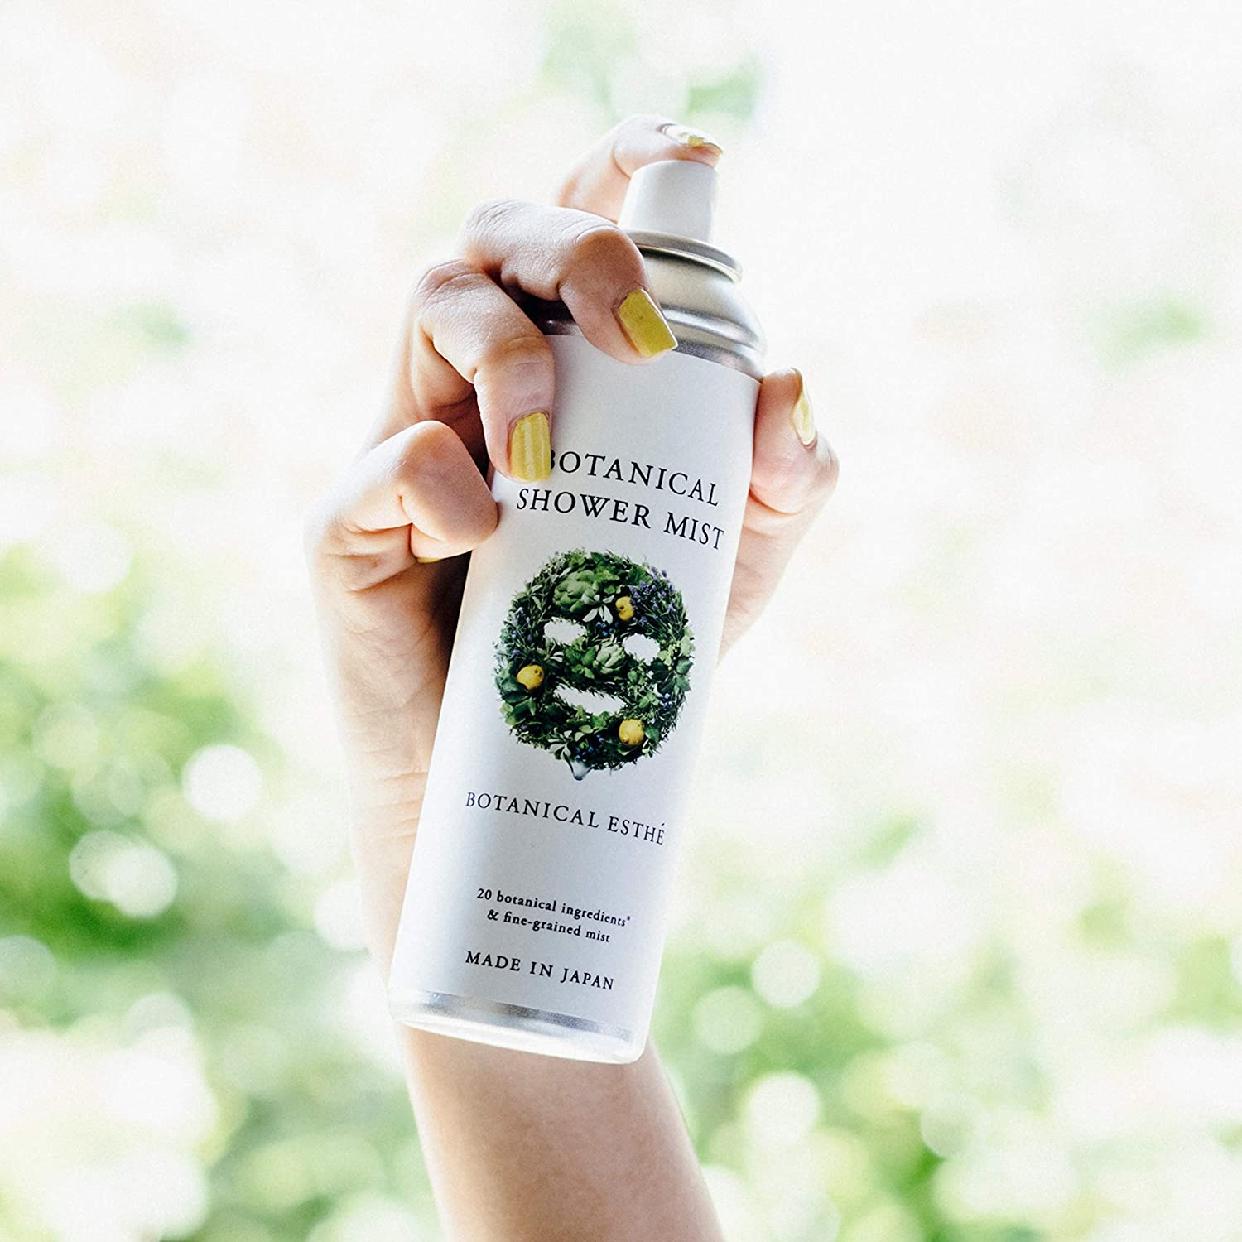 BOTANICAL ESTHE(ボタニカルエステ) ボタニカルシャワーミスト 化粧水の商品画像8